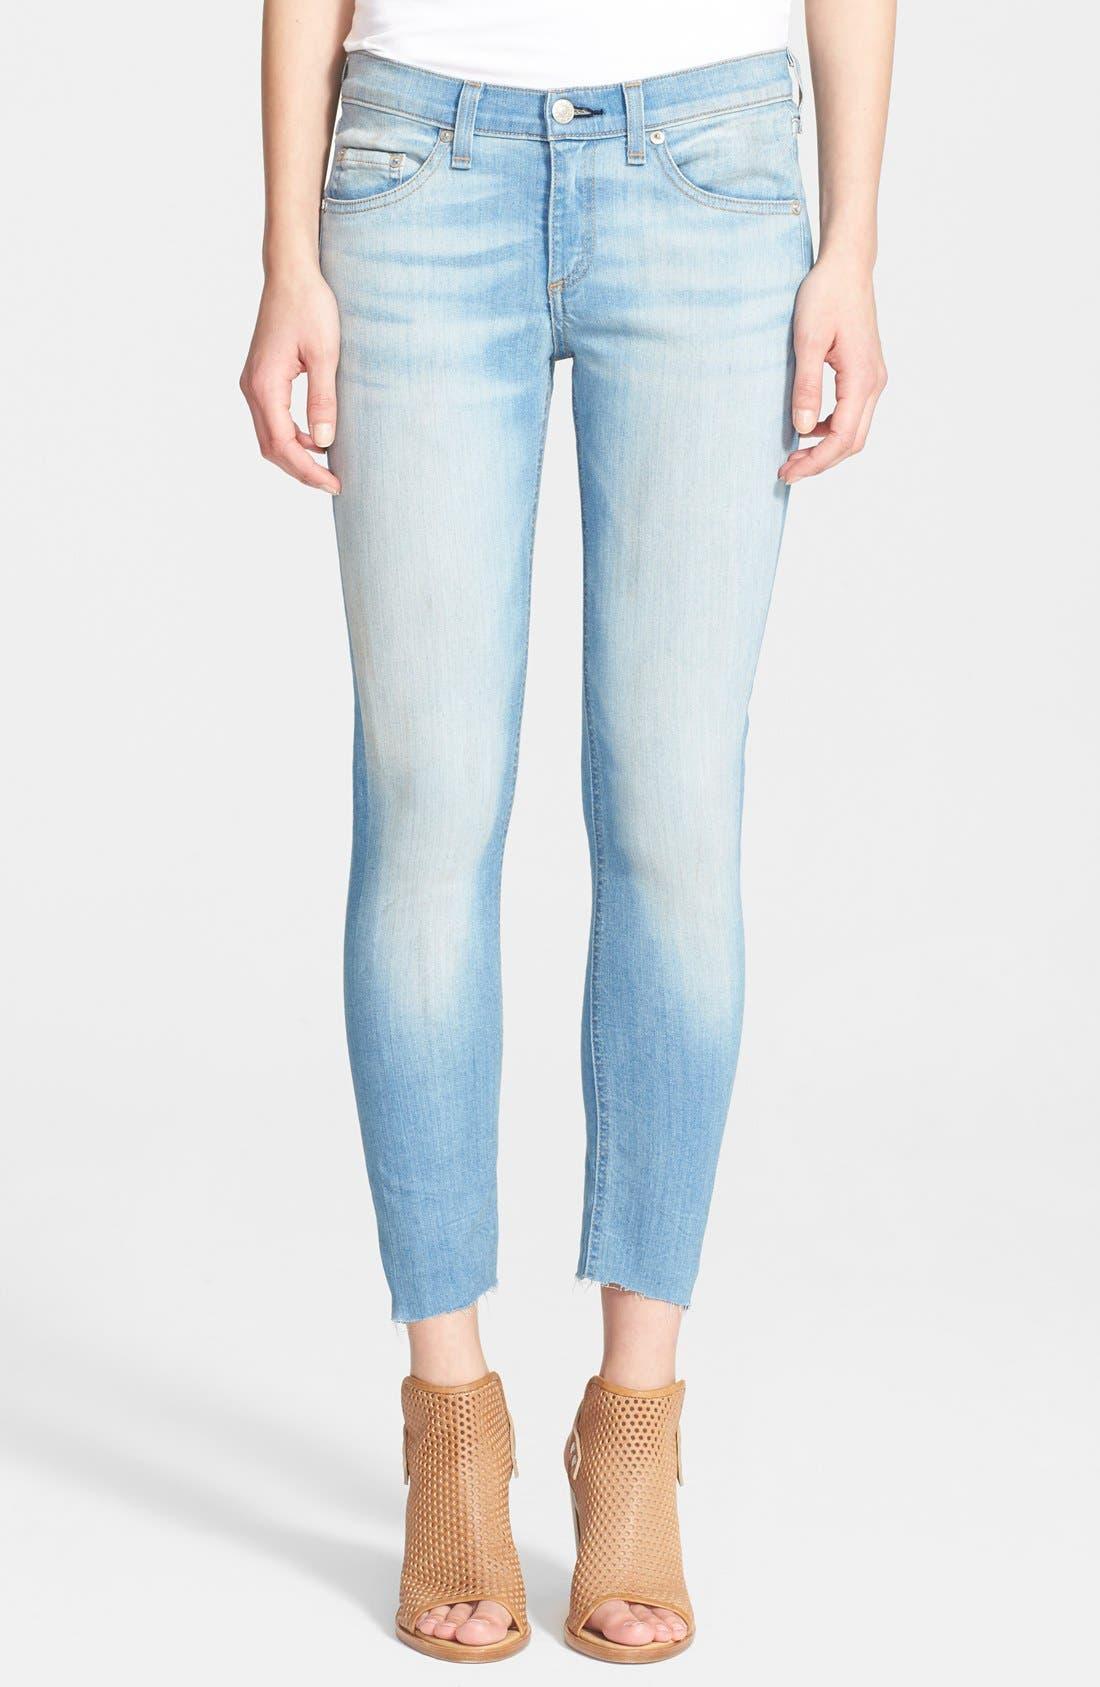 Alternate Image 1 Selected - rag & bone/JEAN Low Rise Crop Skinny Jeans